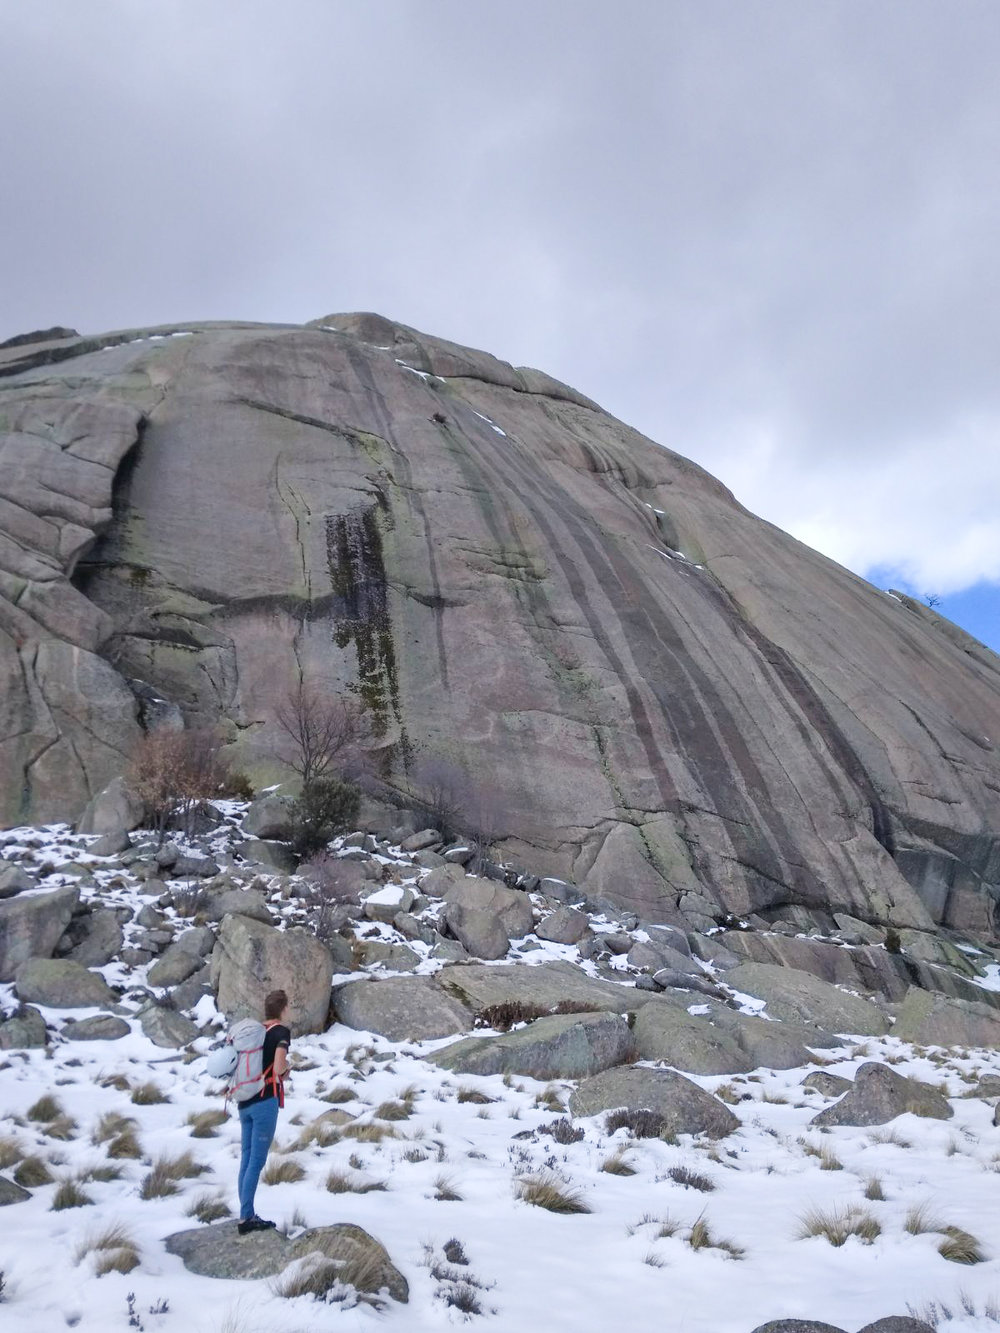 climbinginspain-4.jpg